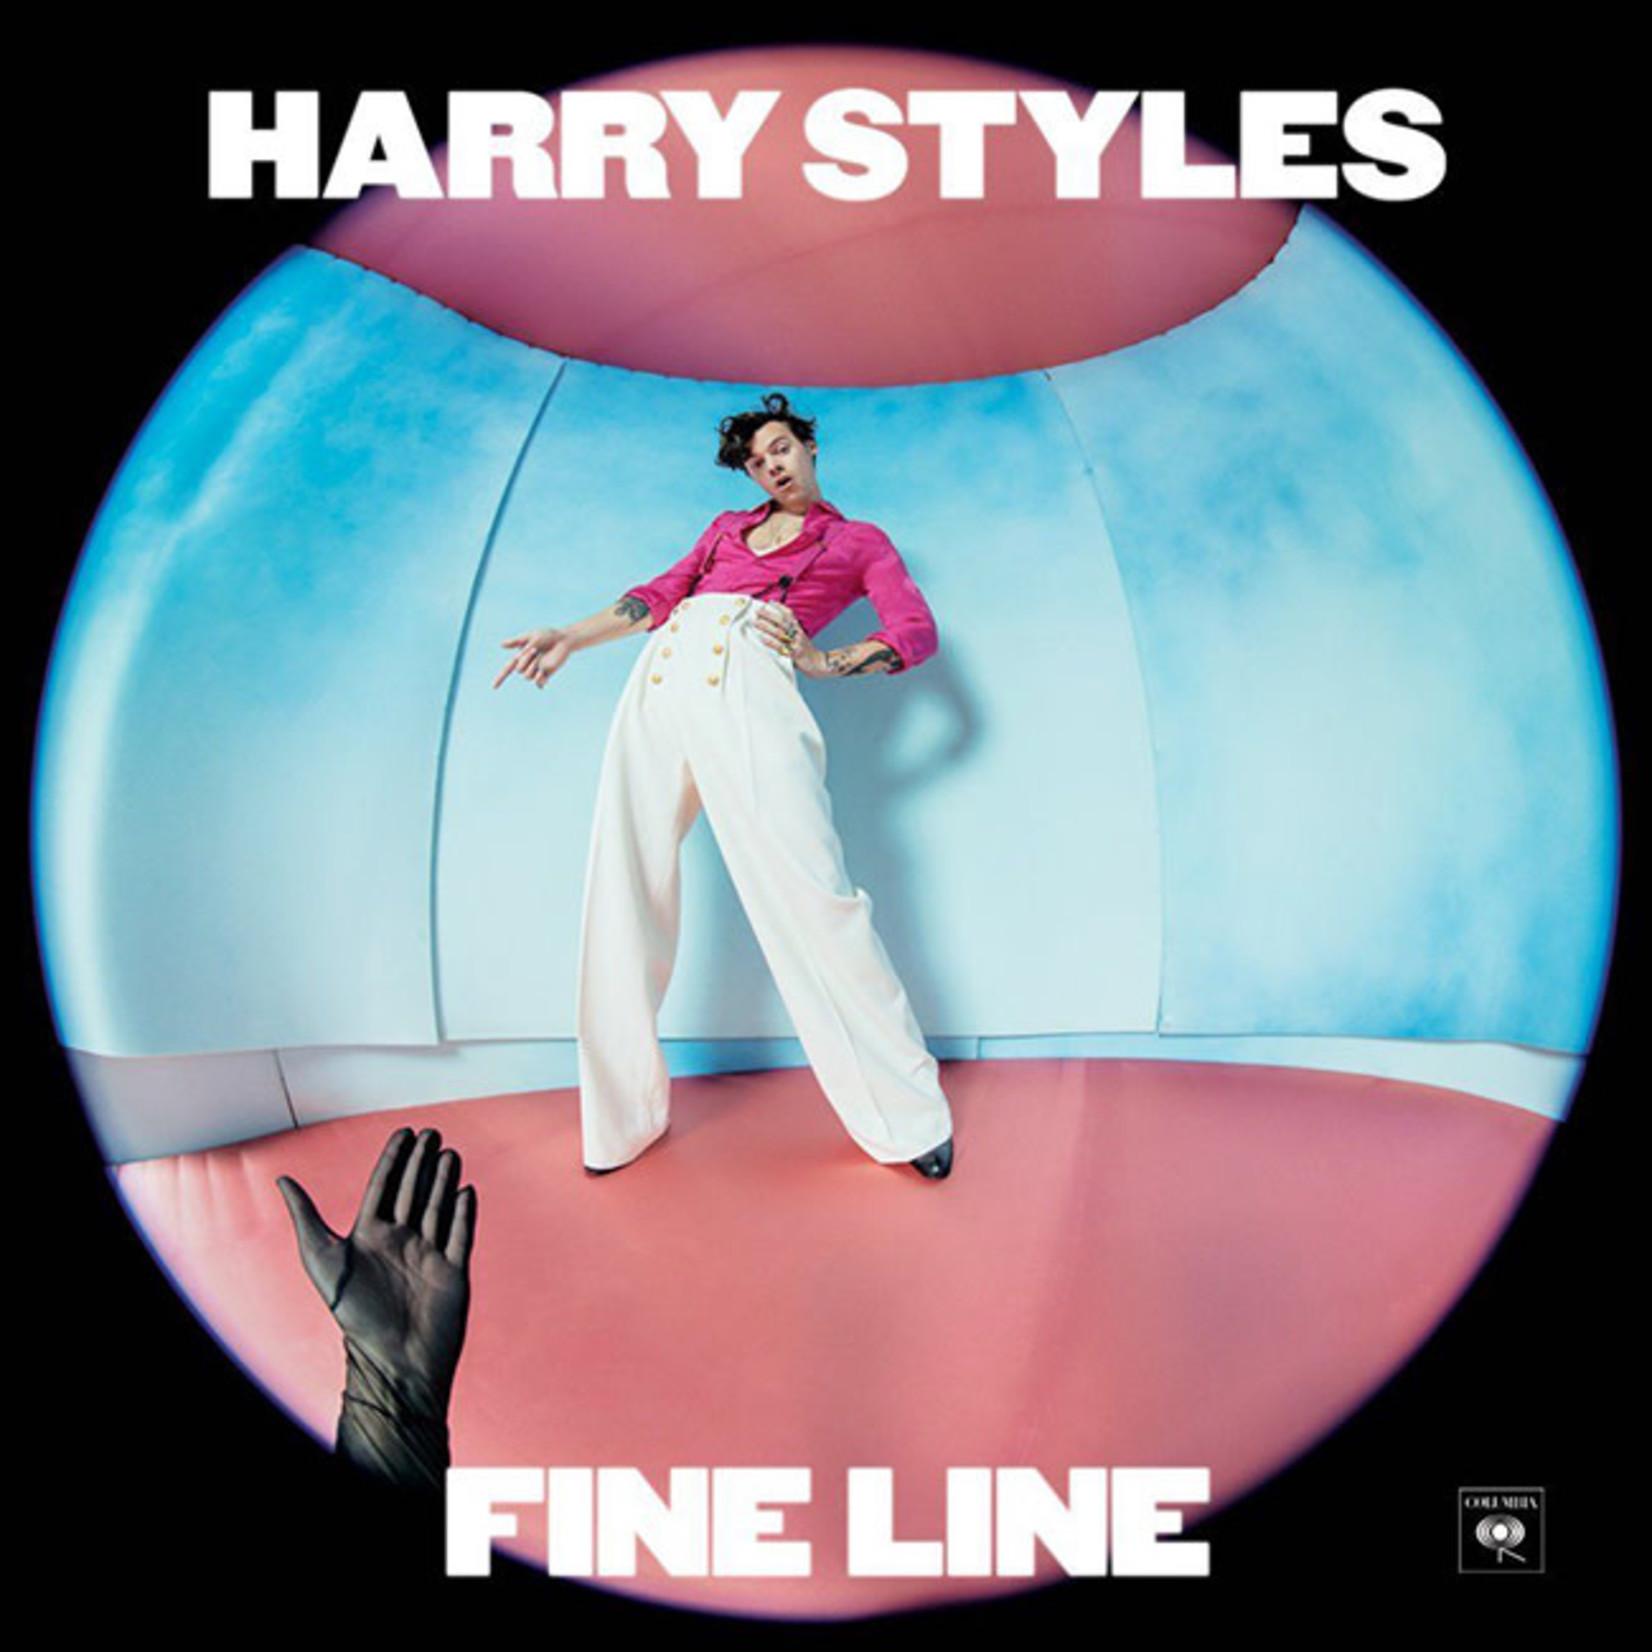 [New] Styles, Harry: Fine Line